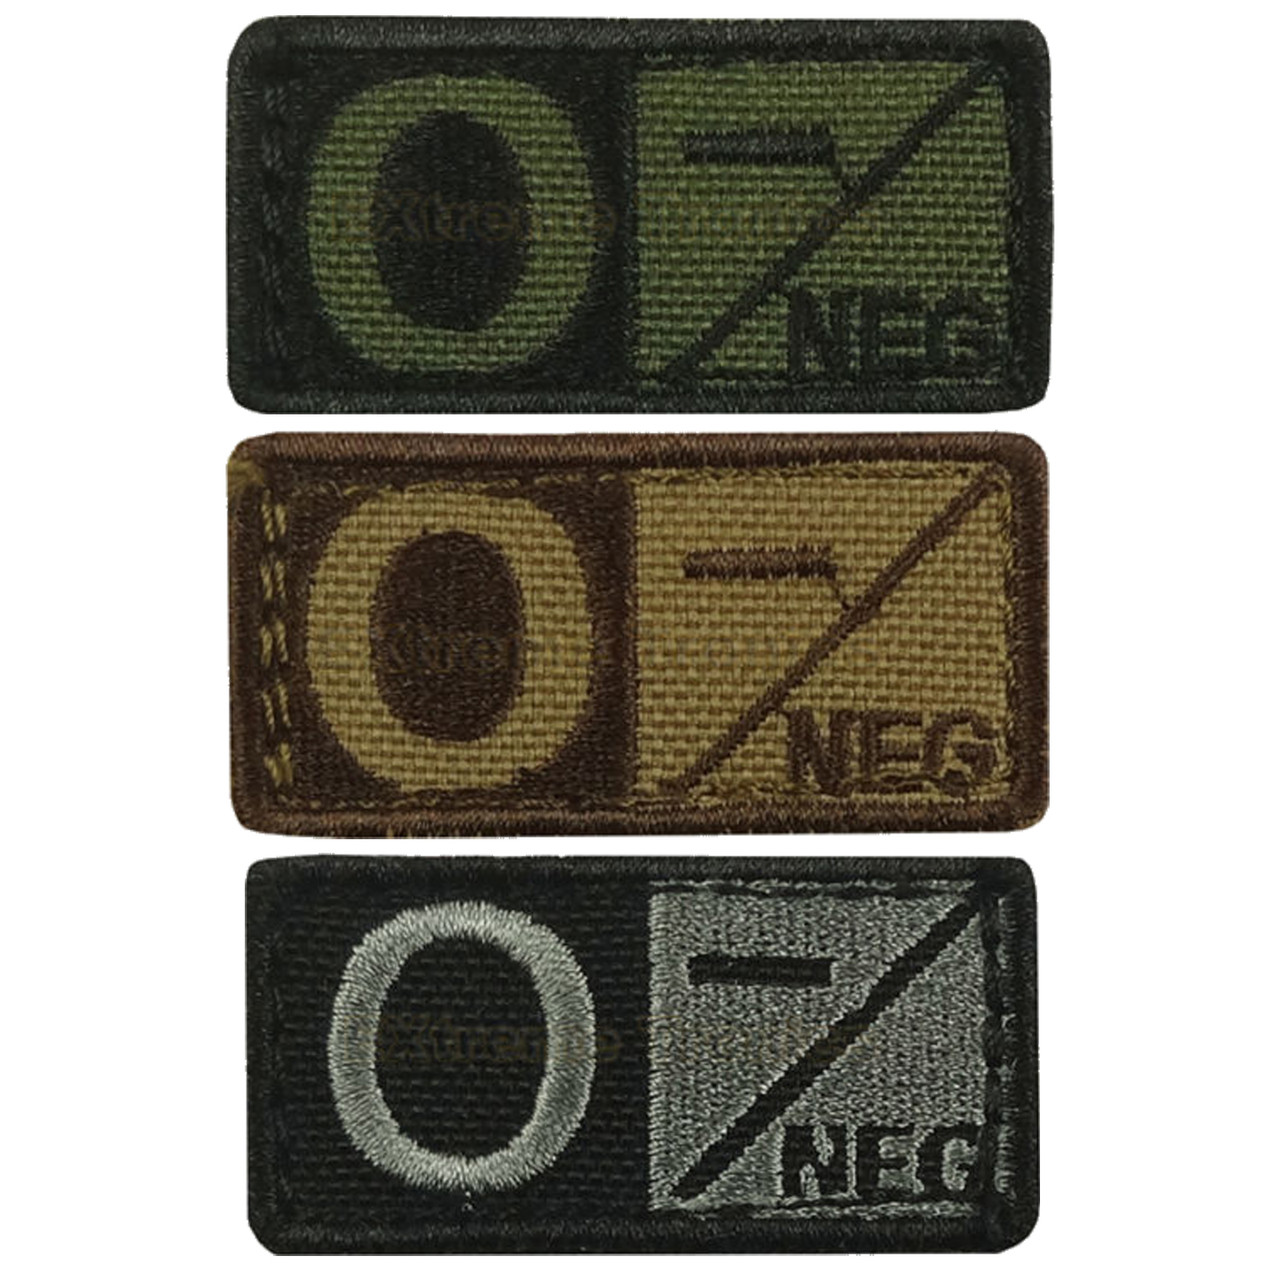 CONDOR 229O Tactical Militaty Blood Type Patch O NEGATIVE O TAN